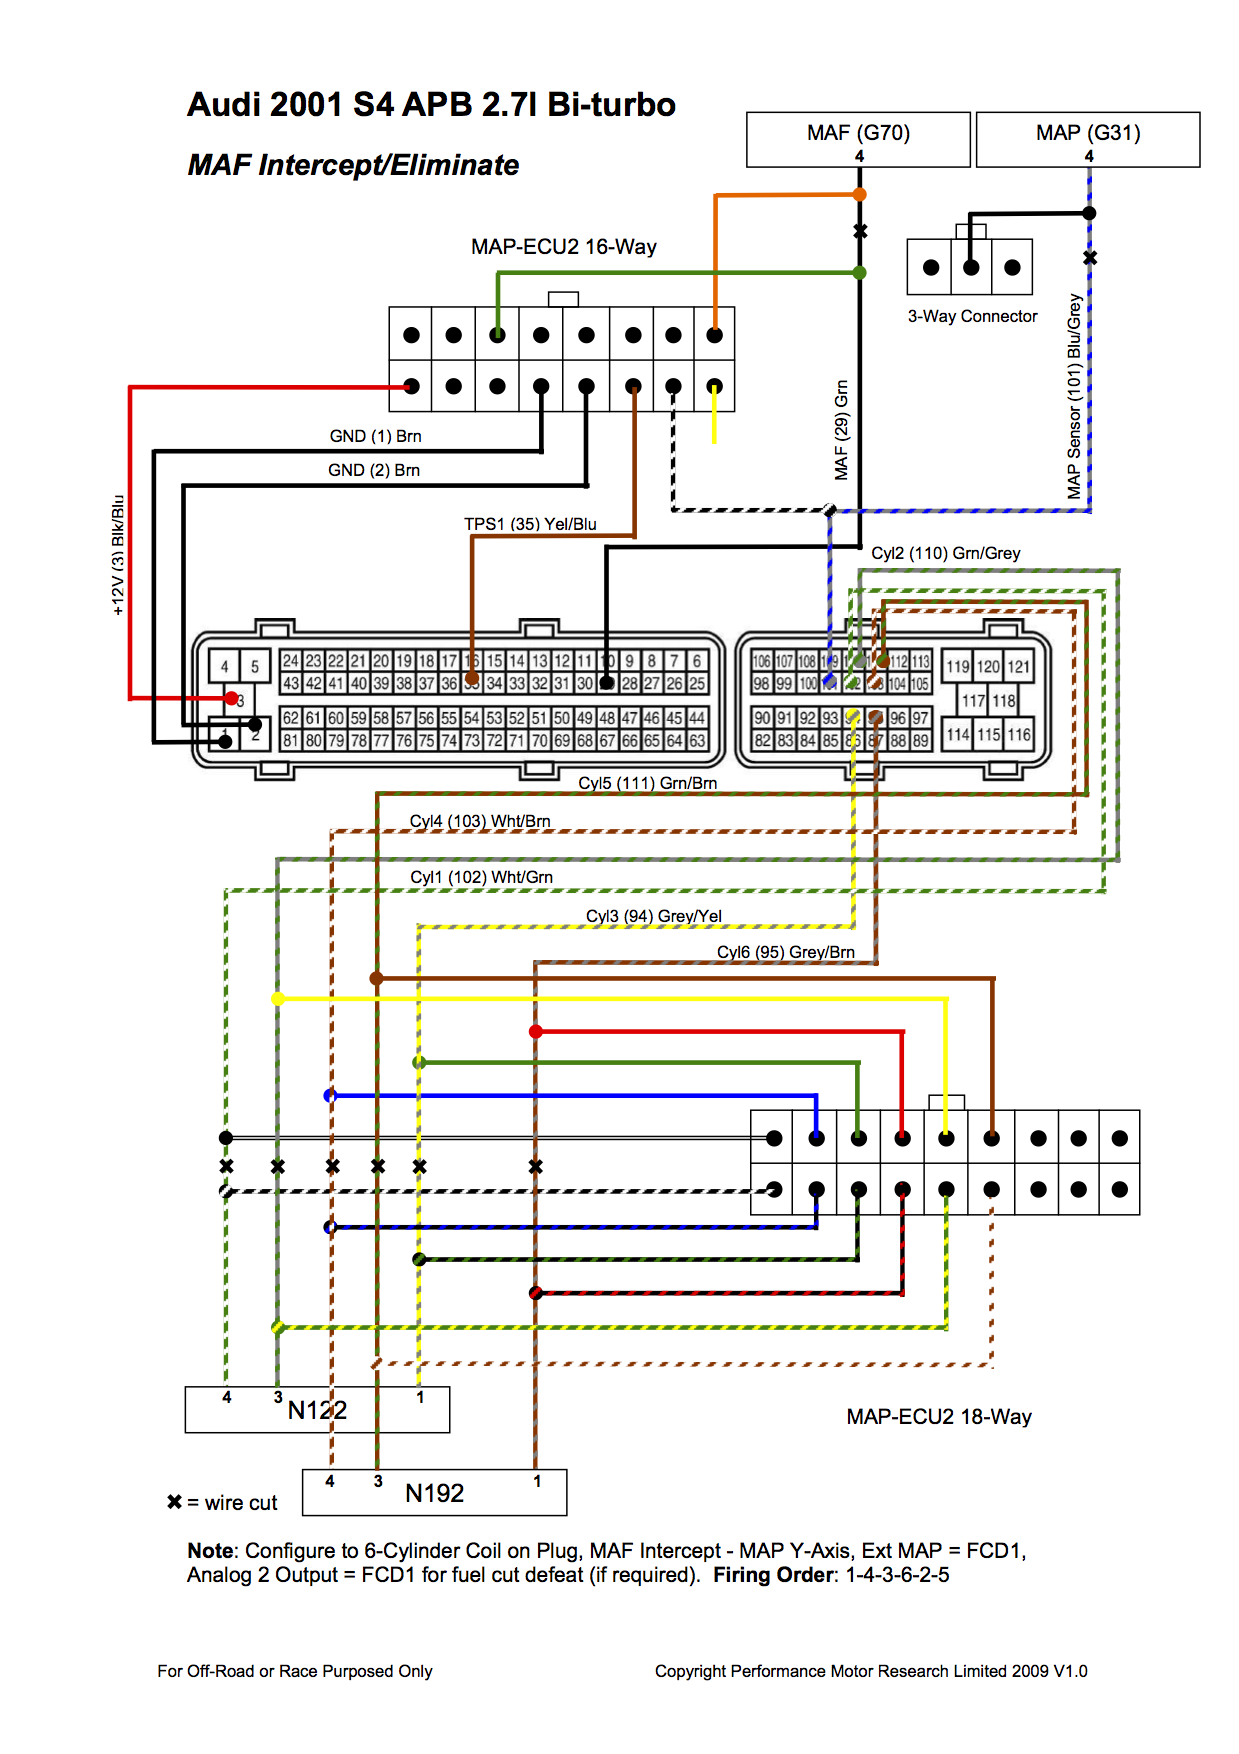 92 Lexus Es 300 Stereo Wiring Diagram Get Free Image About Wiring